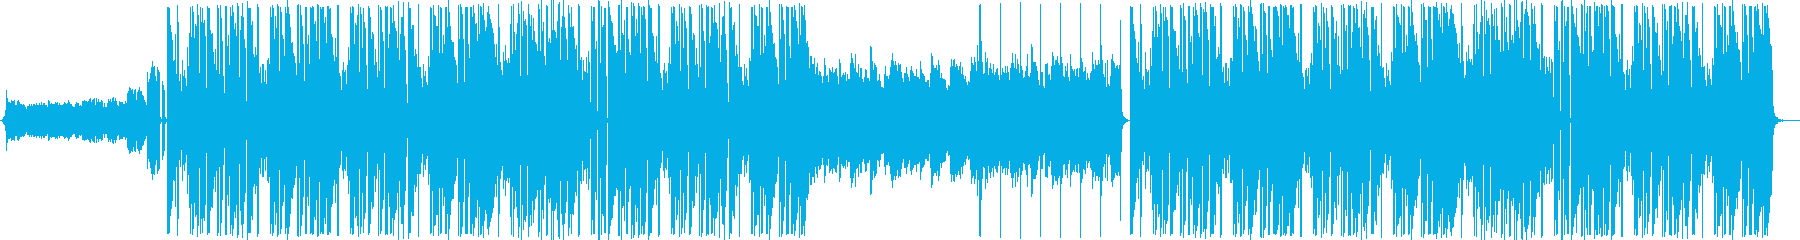 lofi感のあるTrap Beatの再生済みの波形